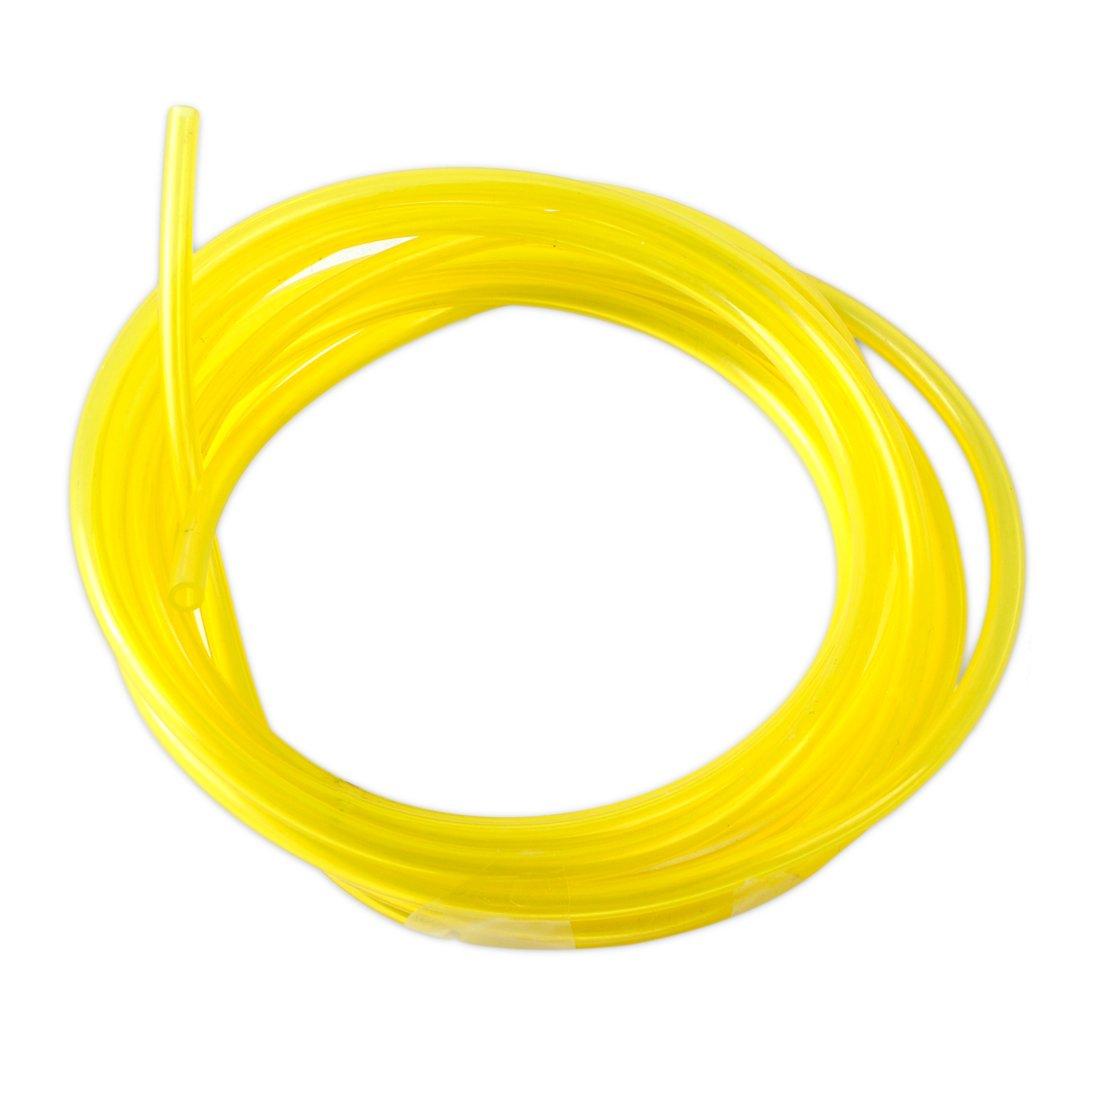 15 m 12 mm – 10 mm gelb Pneumatik Flexible Rohr Tubing Air Airline ölBesteändig PA6